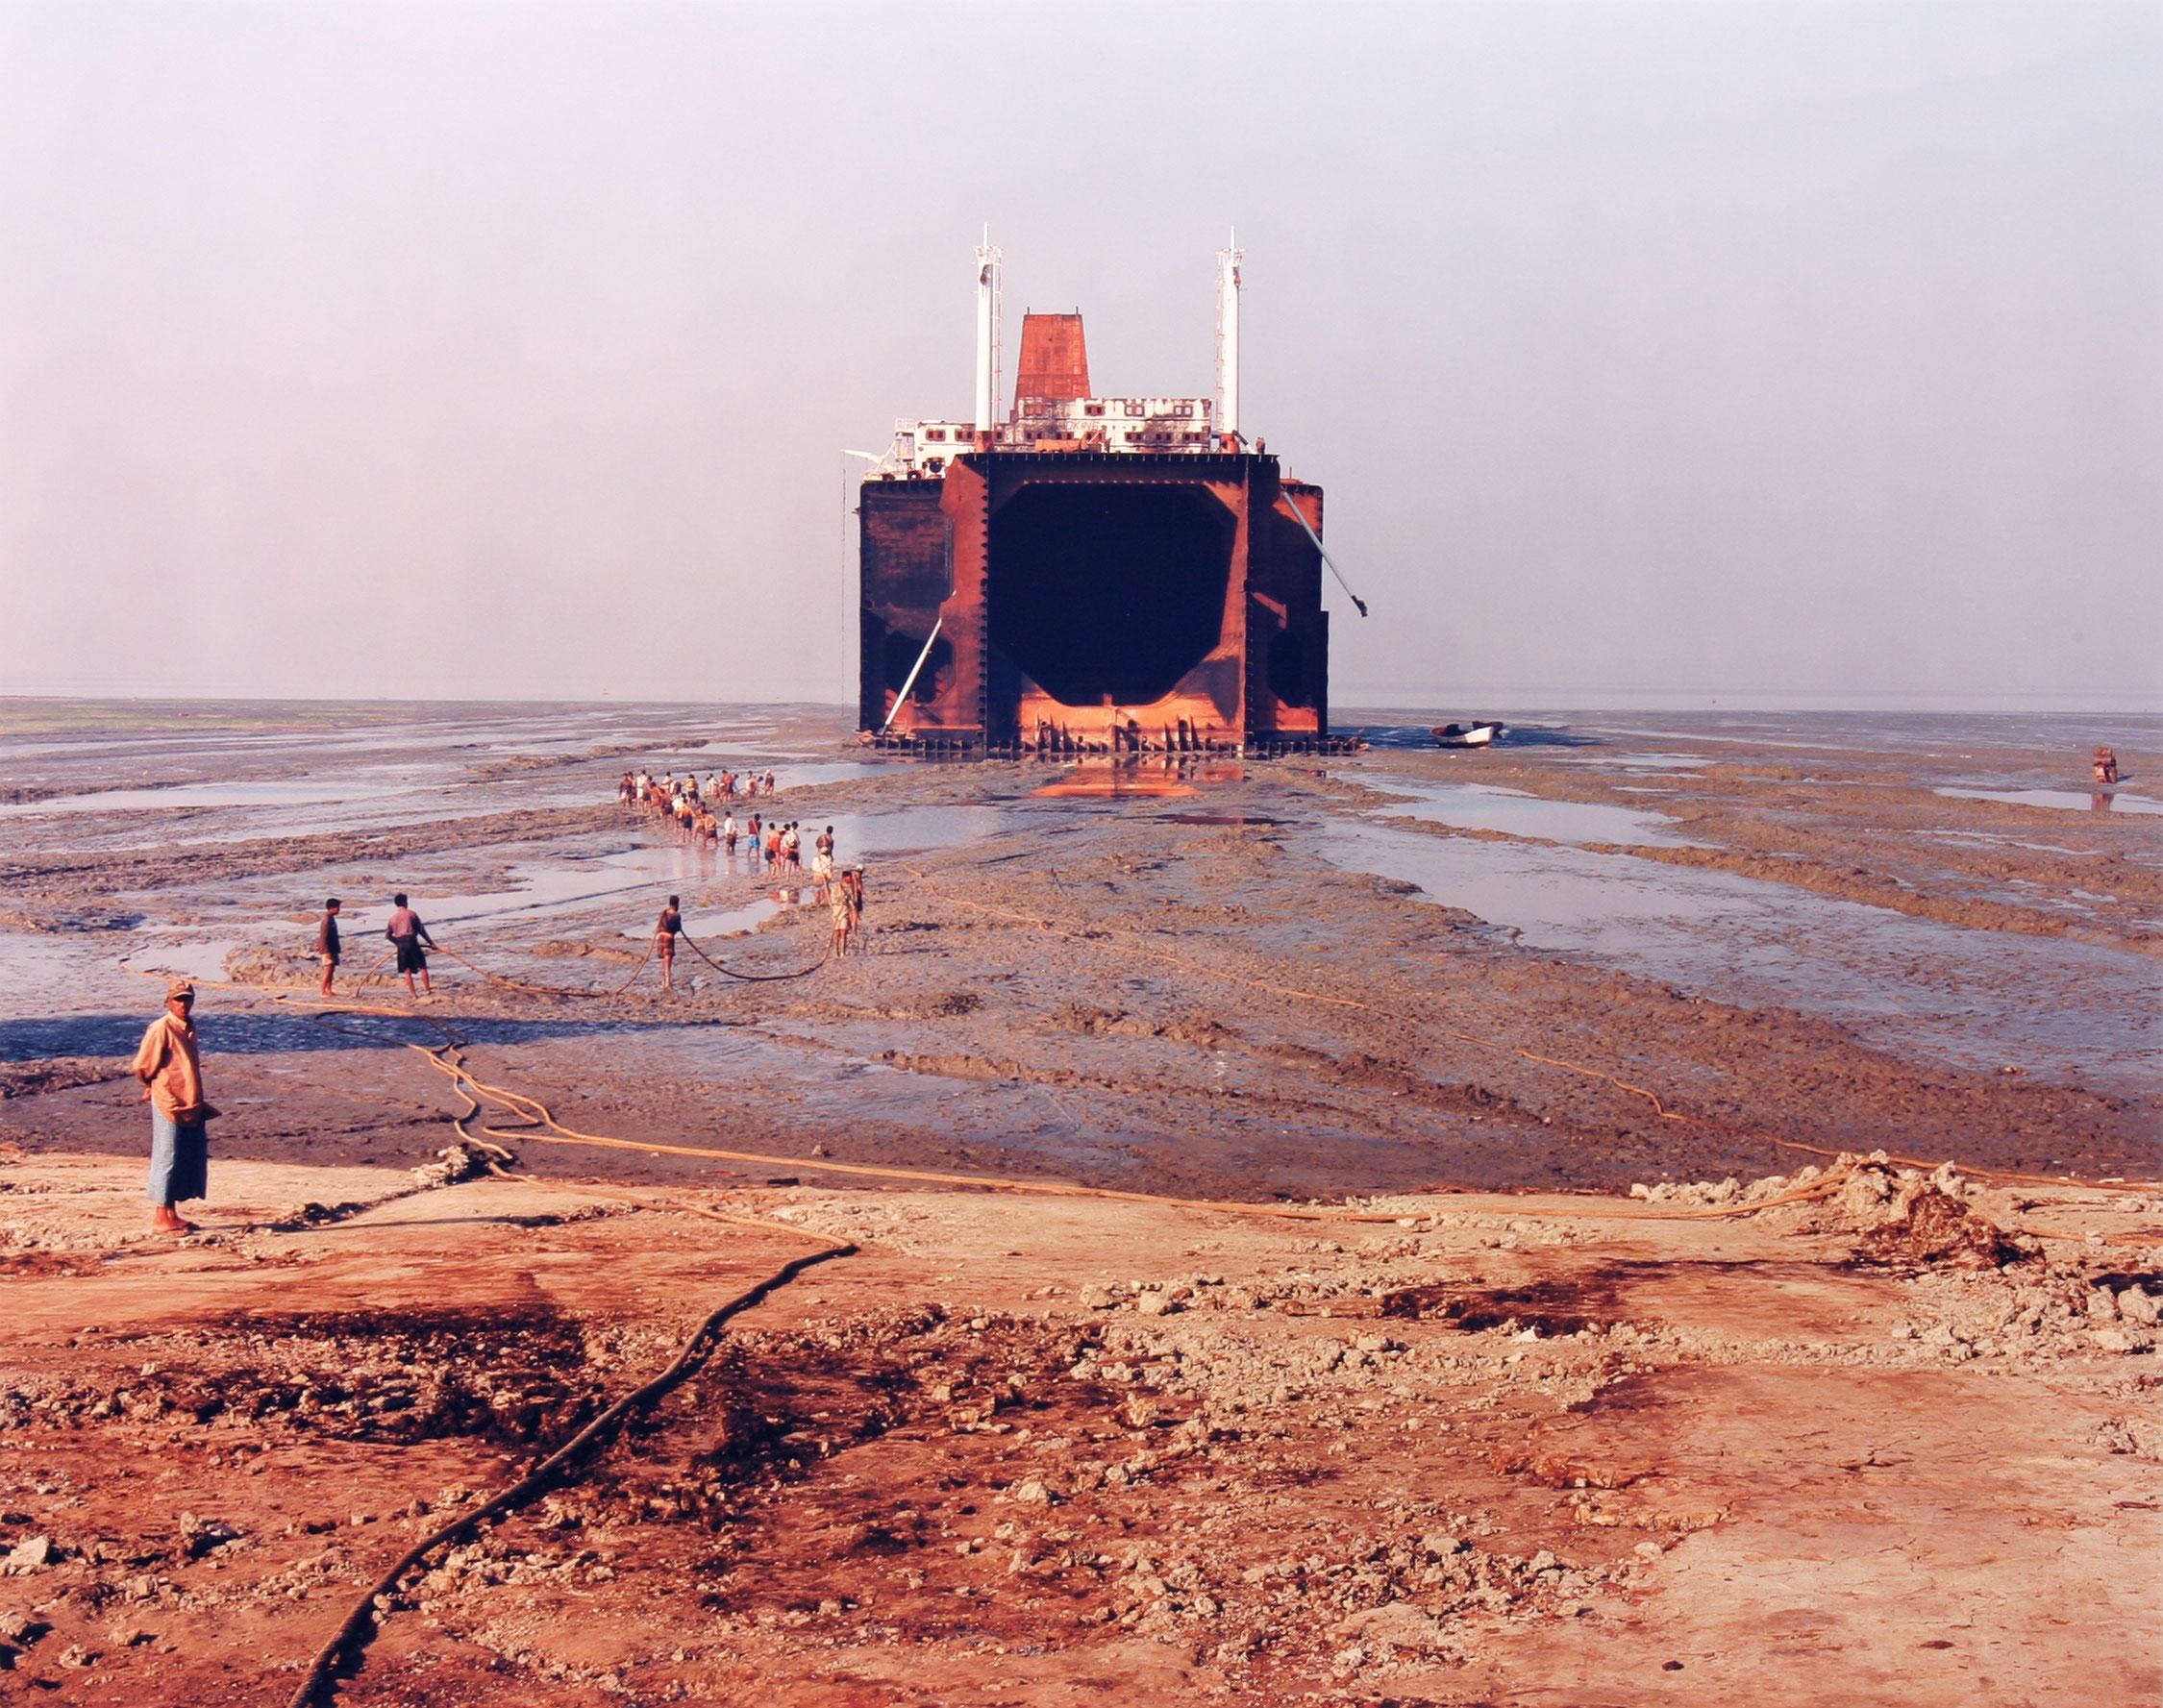 Shipbreaking No. 29, Chittagong, Bangladesh, 2001, tirage de 2002, Edward Burtynsky, Épreuve à développement chromogène, 2/10.